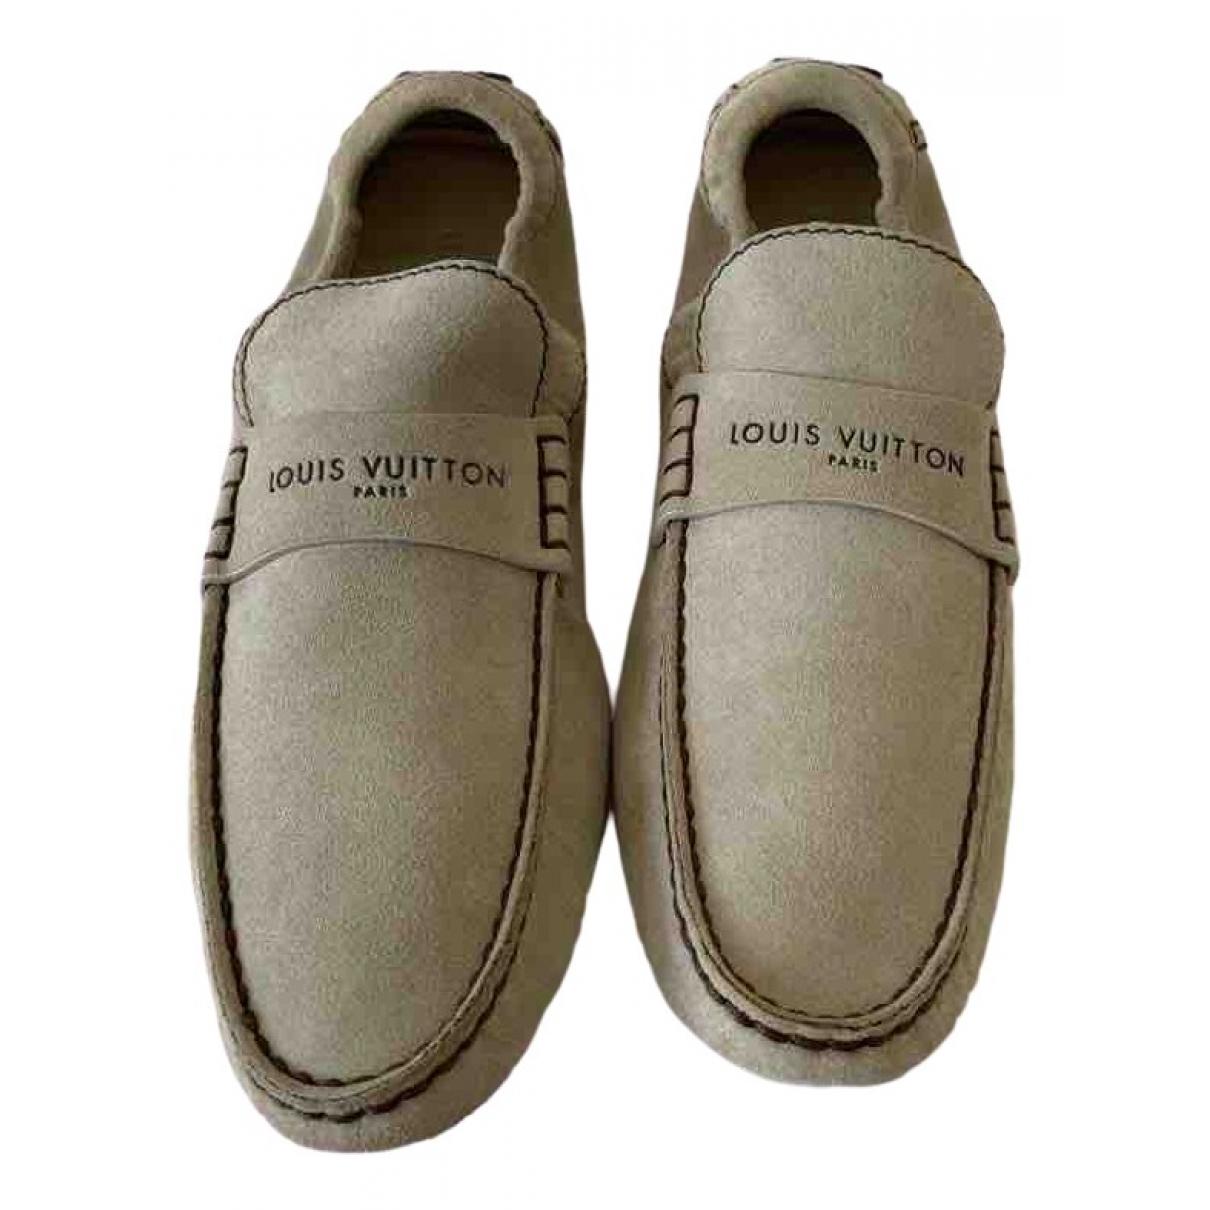 Louis Vuitton \N Mokassins in  Beige Veloursleder